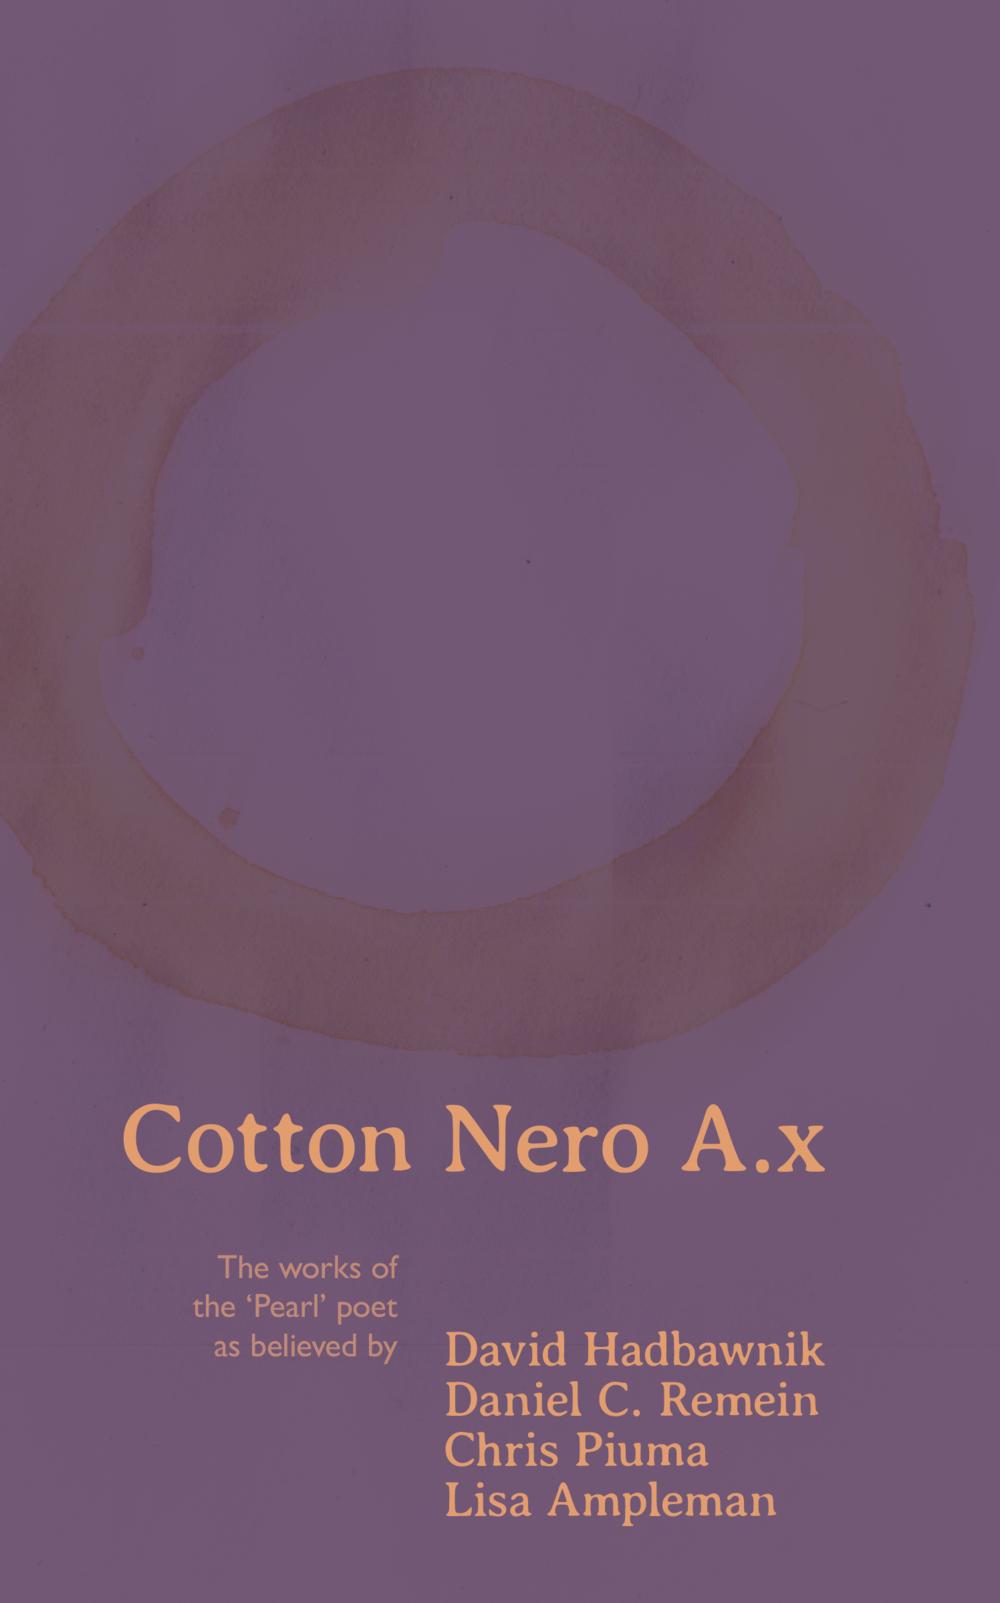 Cotton Nero A.x / Hadbawnik, Remein, Piuma, Ampleman